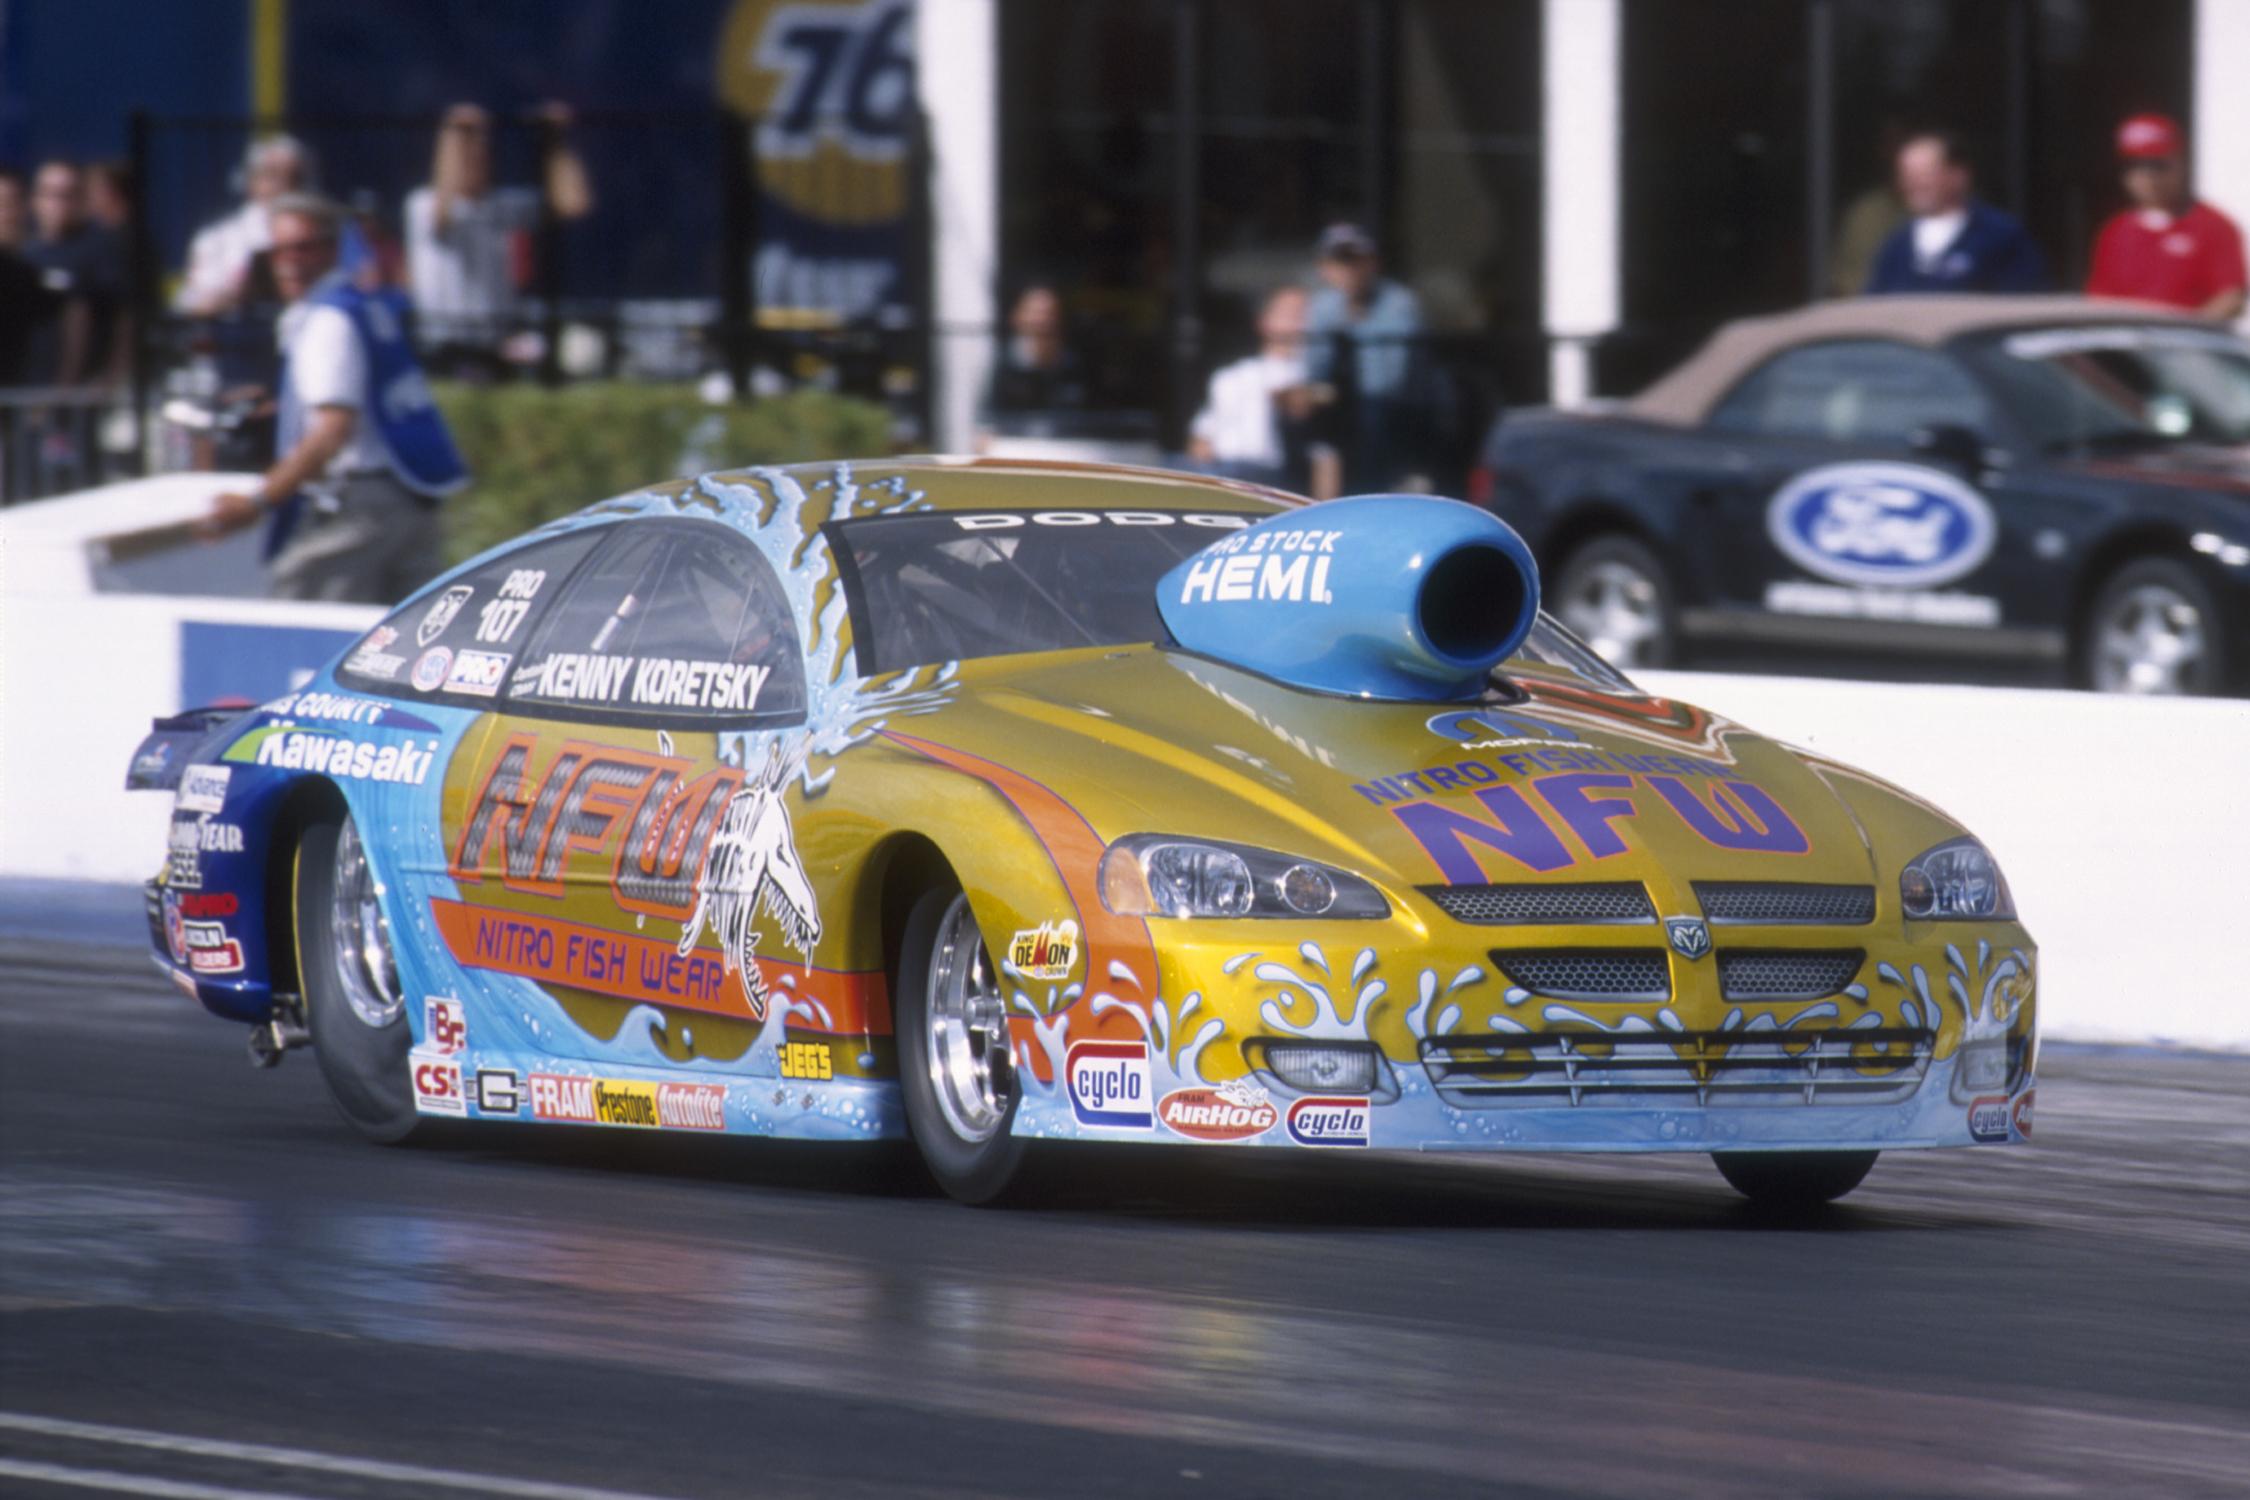 2004 Nhra Pro Stock Pro Stock Drag Race Racing Hot Rod